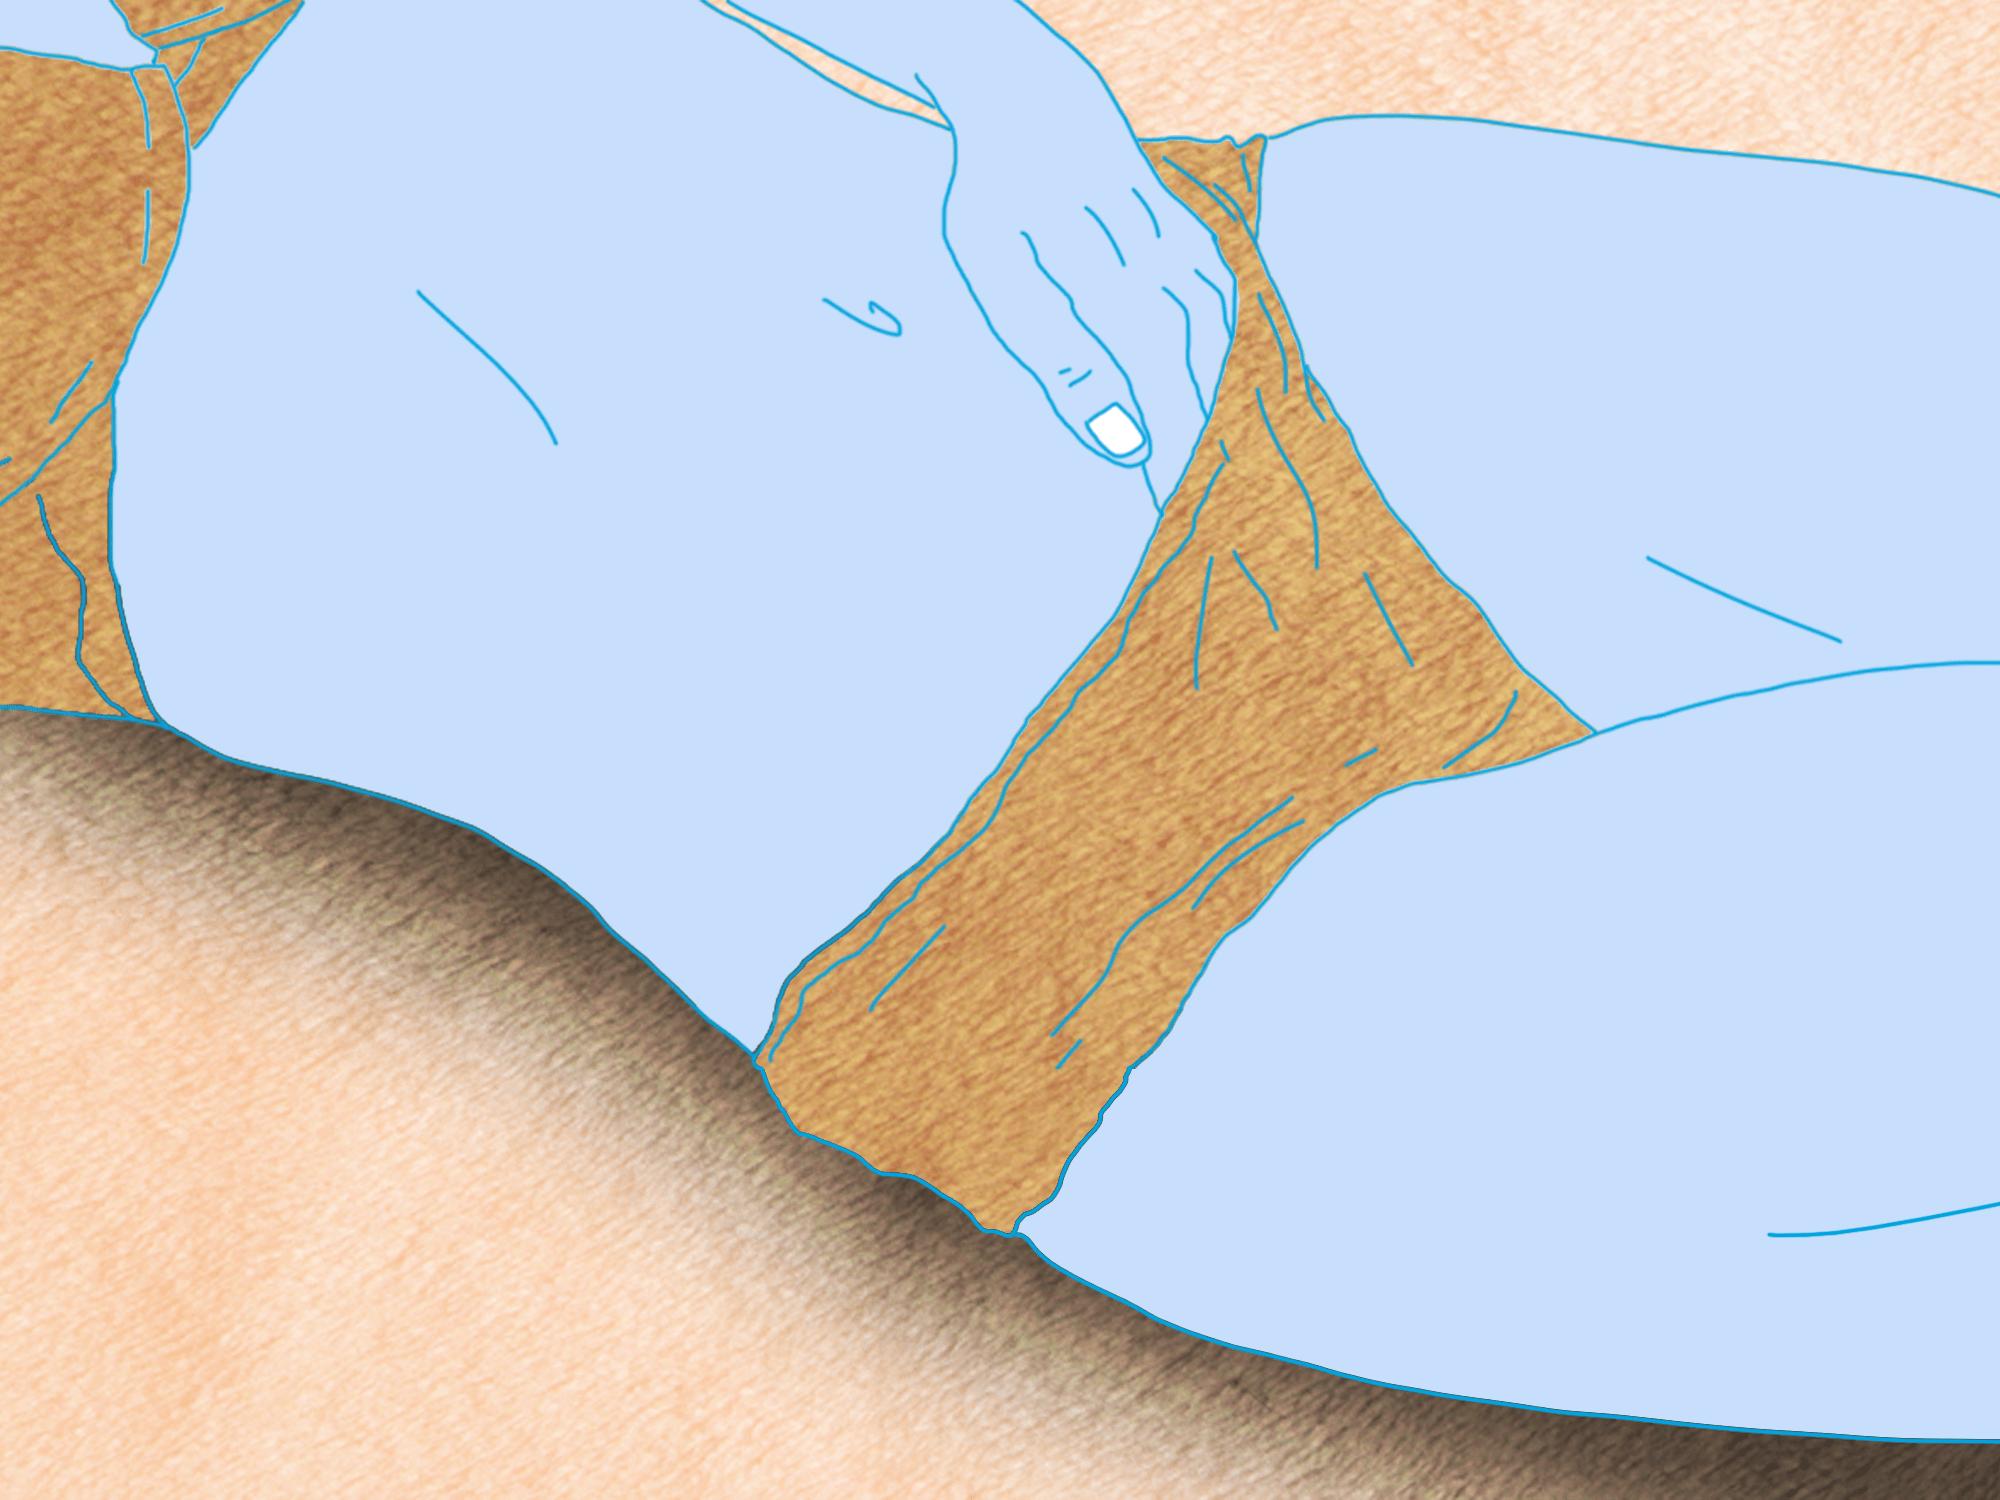 Long clitoris labia video